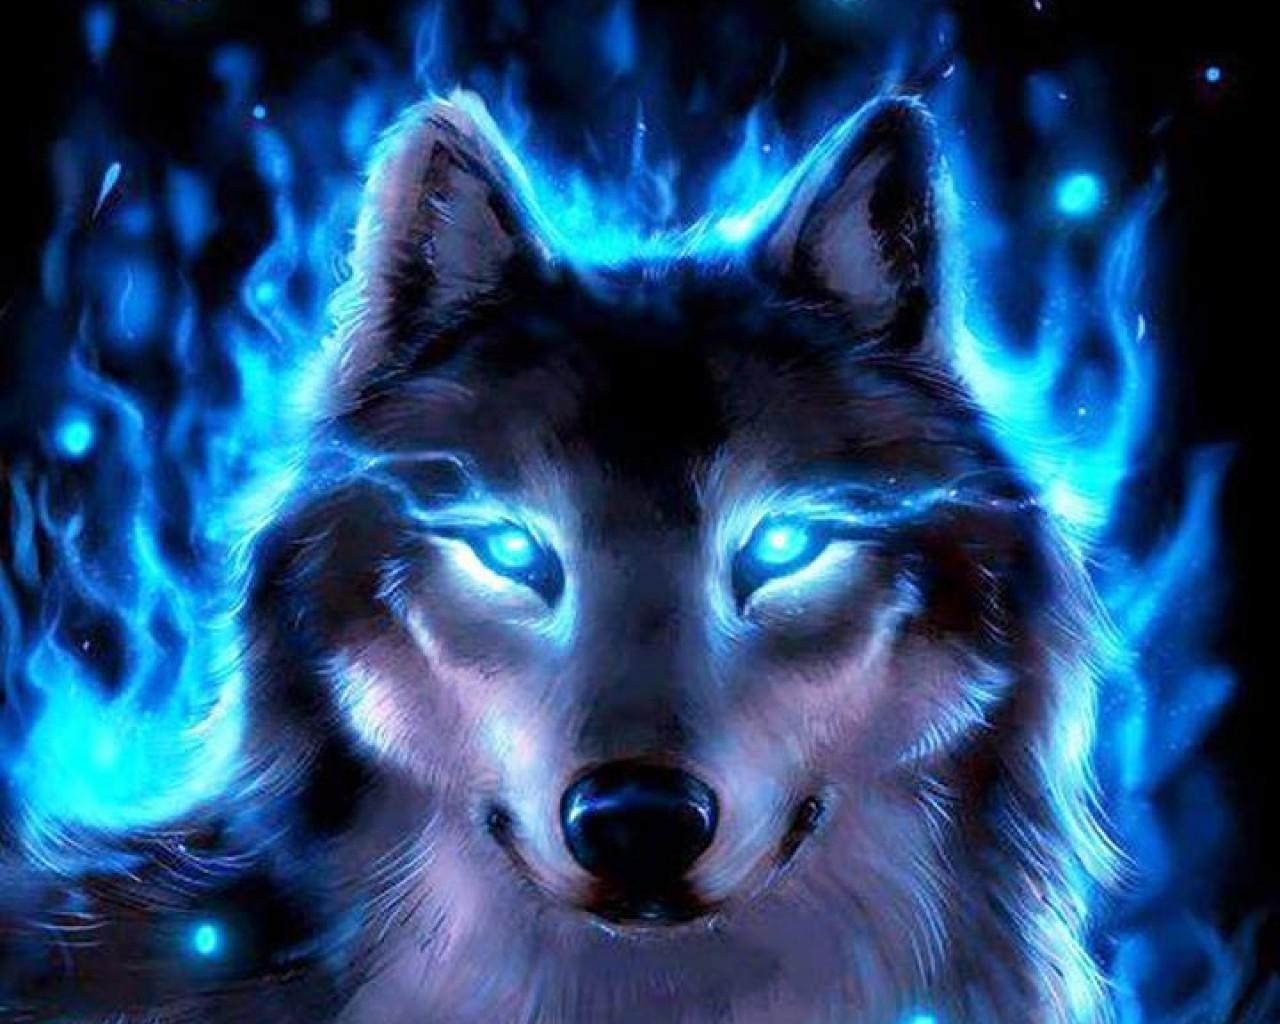 pin wallpaper cool wolf - photo #5